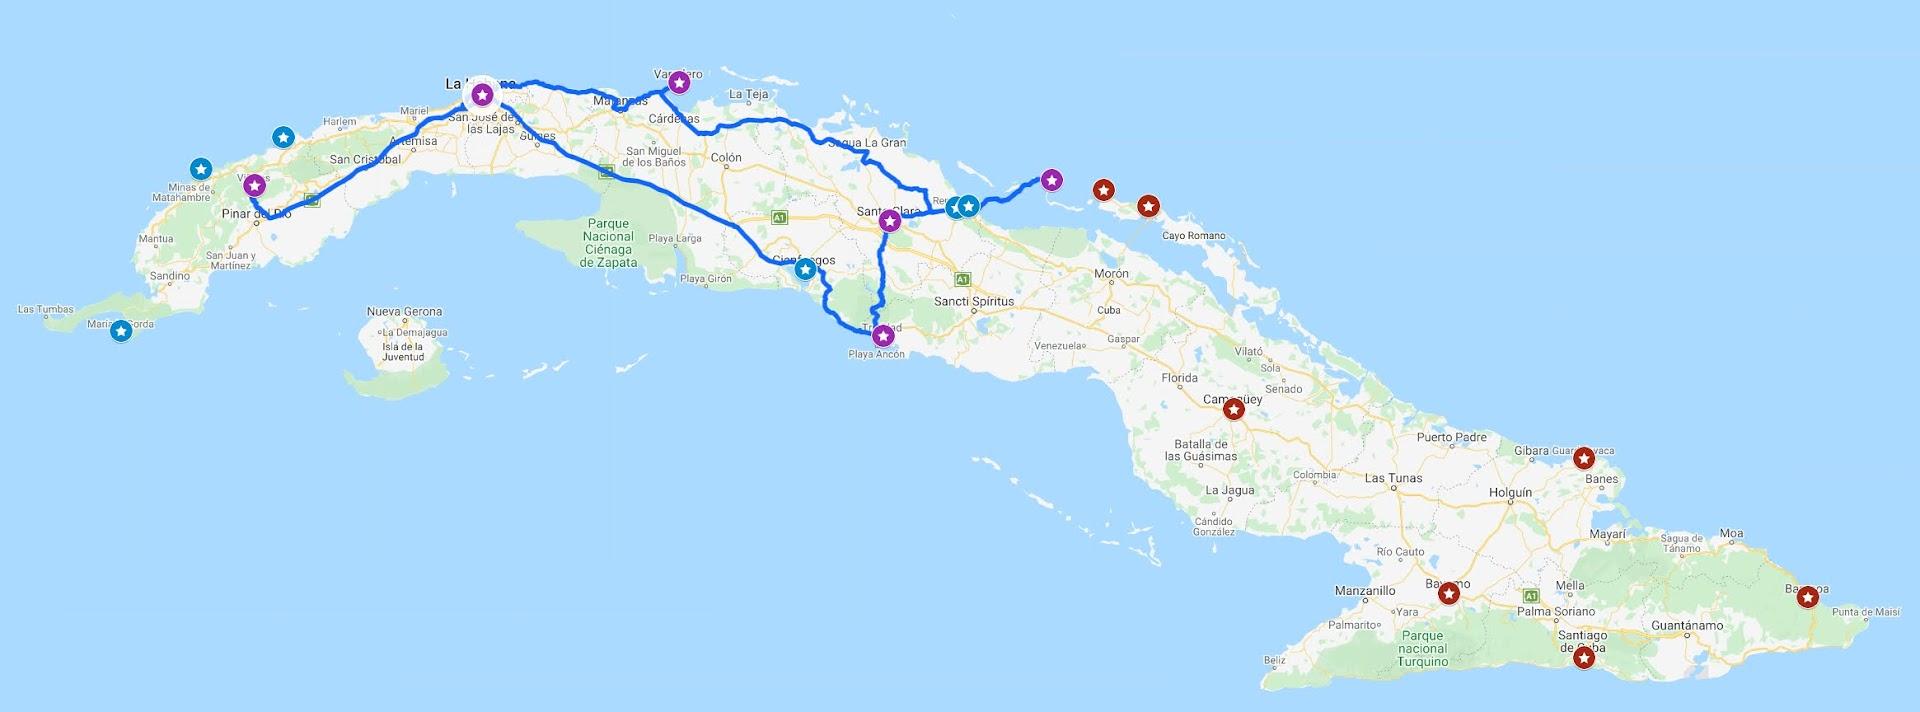 Itinerario viaje a Cuba